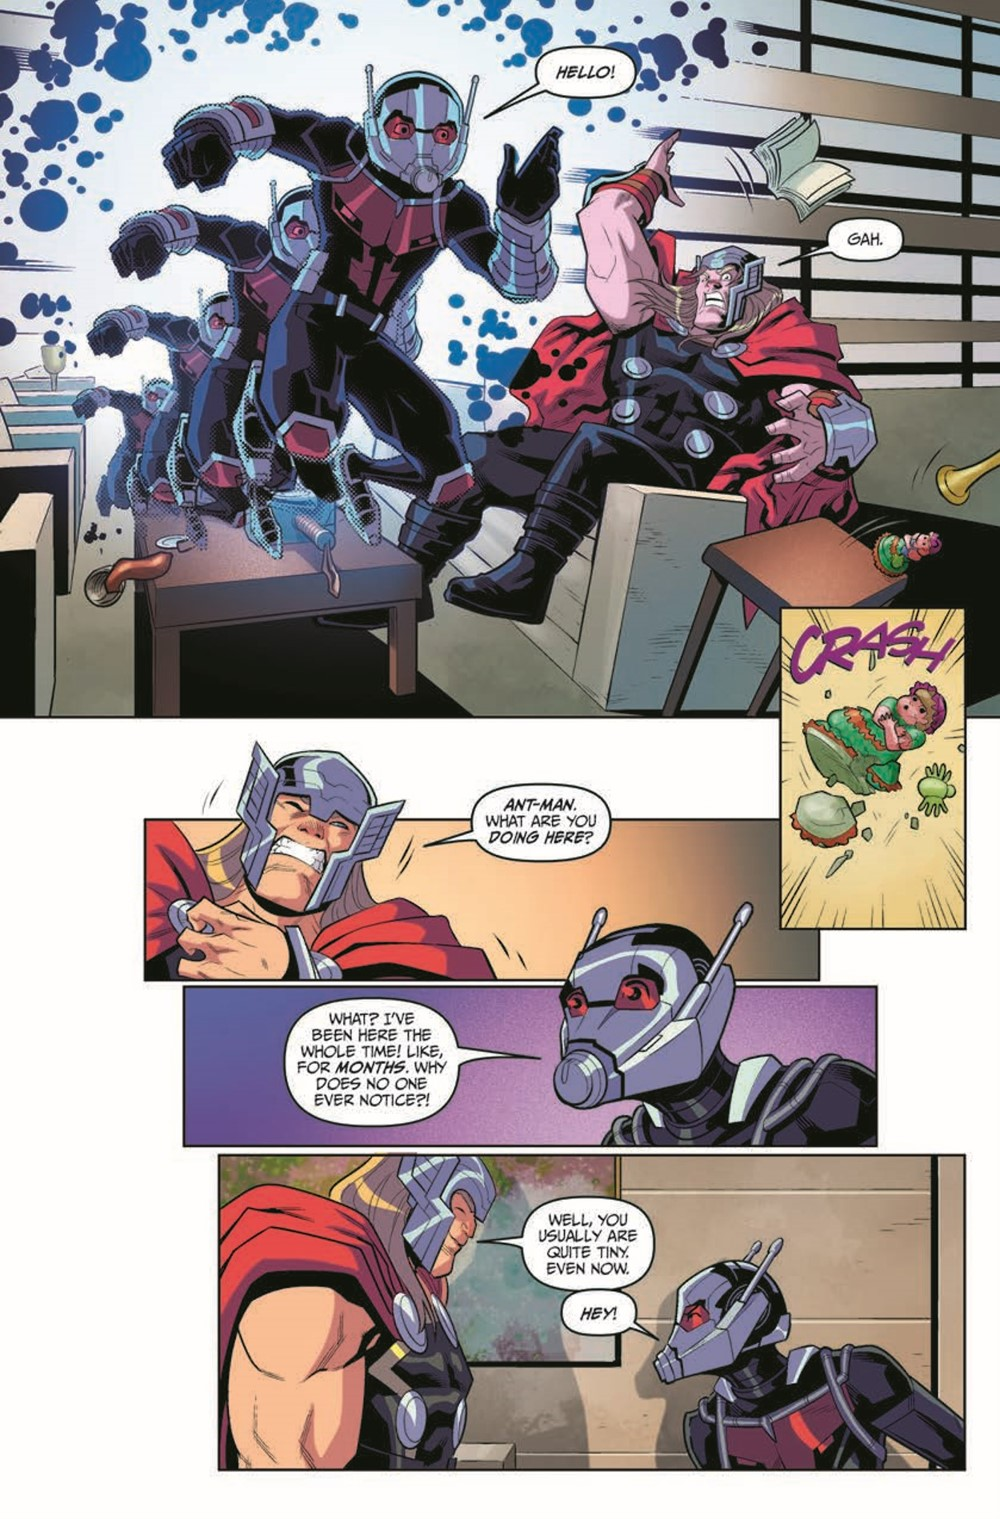 MarvelAction_Avengers_Vol.1_OffTheClock_TPB_pr-8 ComicList Previews: MARVEL ACTION AVENGERS VOLUME 5 OFF THE CLOCK TP